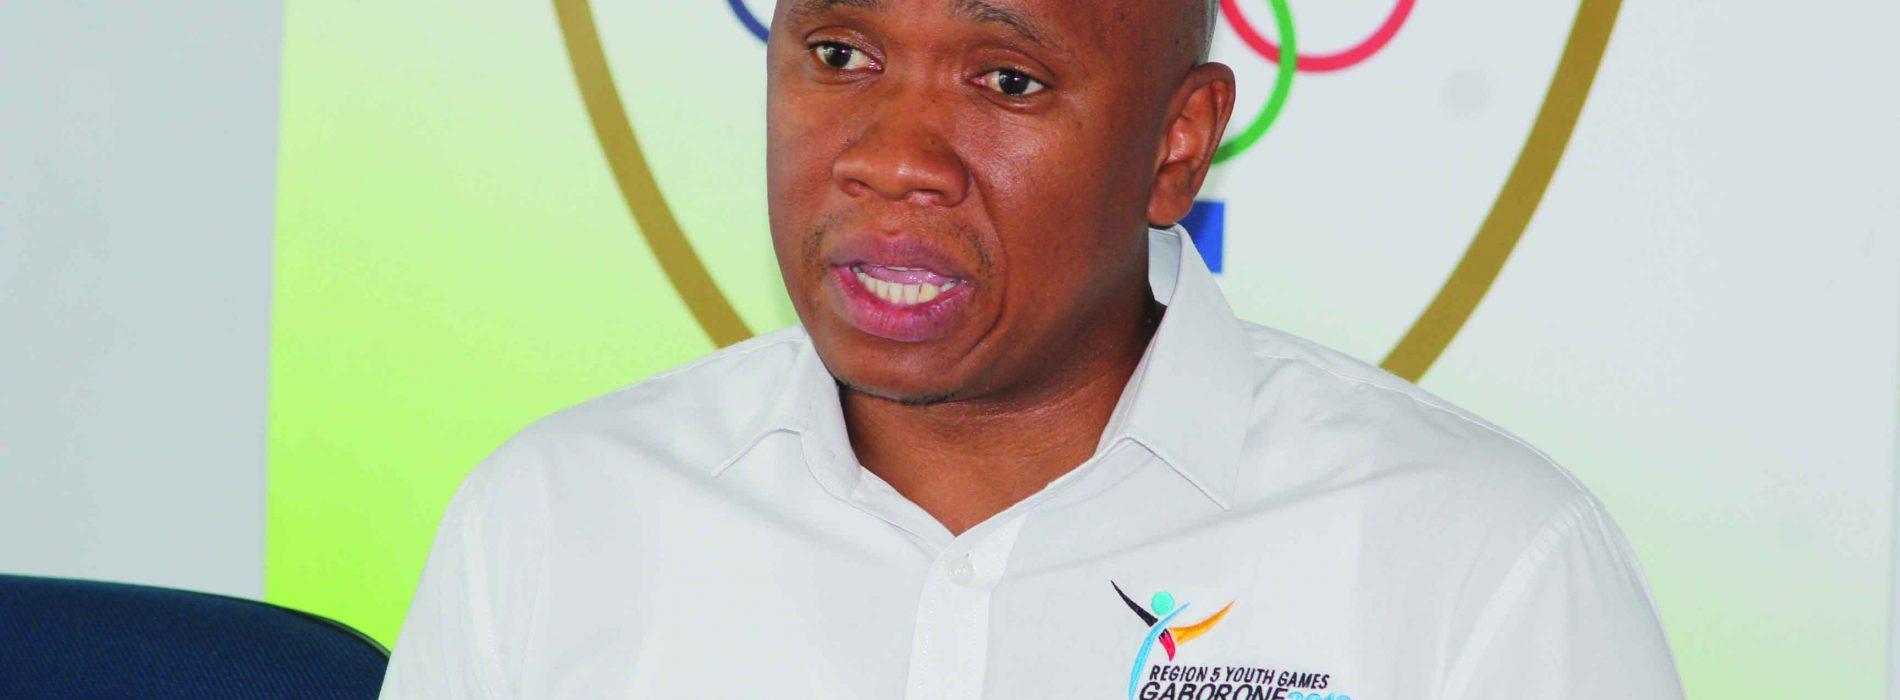 Feuding LVA executives strike deal